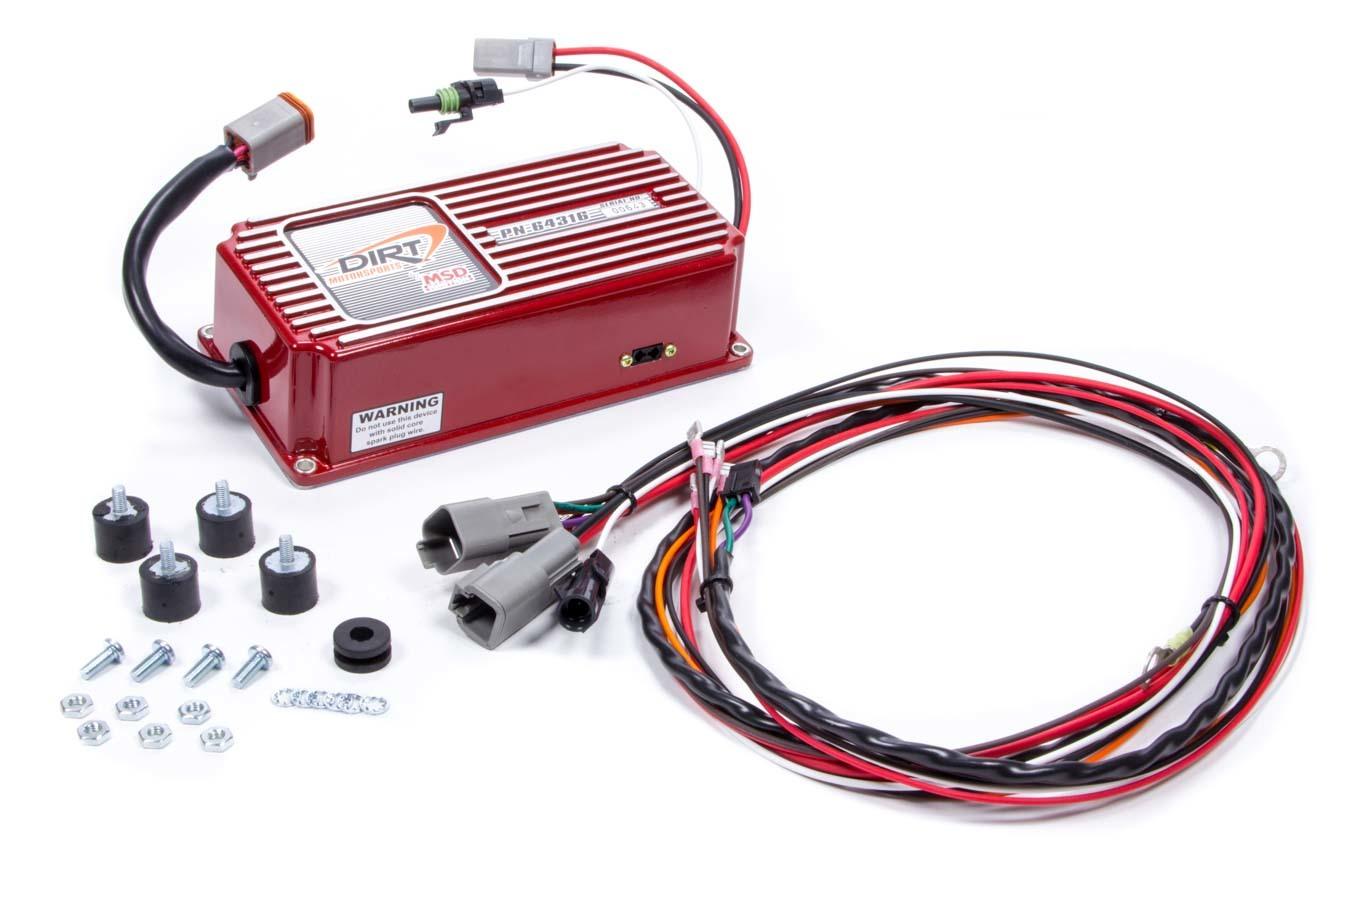 MSD Ignition 64316 Ignition Box, Dirt Motorsports 6ALN, Analog, CD Ignition, Multi-Spark, 45000V, Rev Limiter, Weathertight Connectors, Each